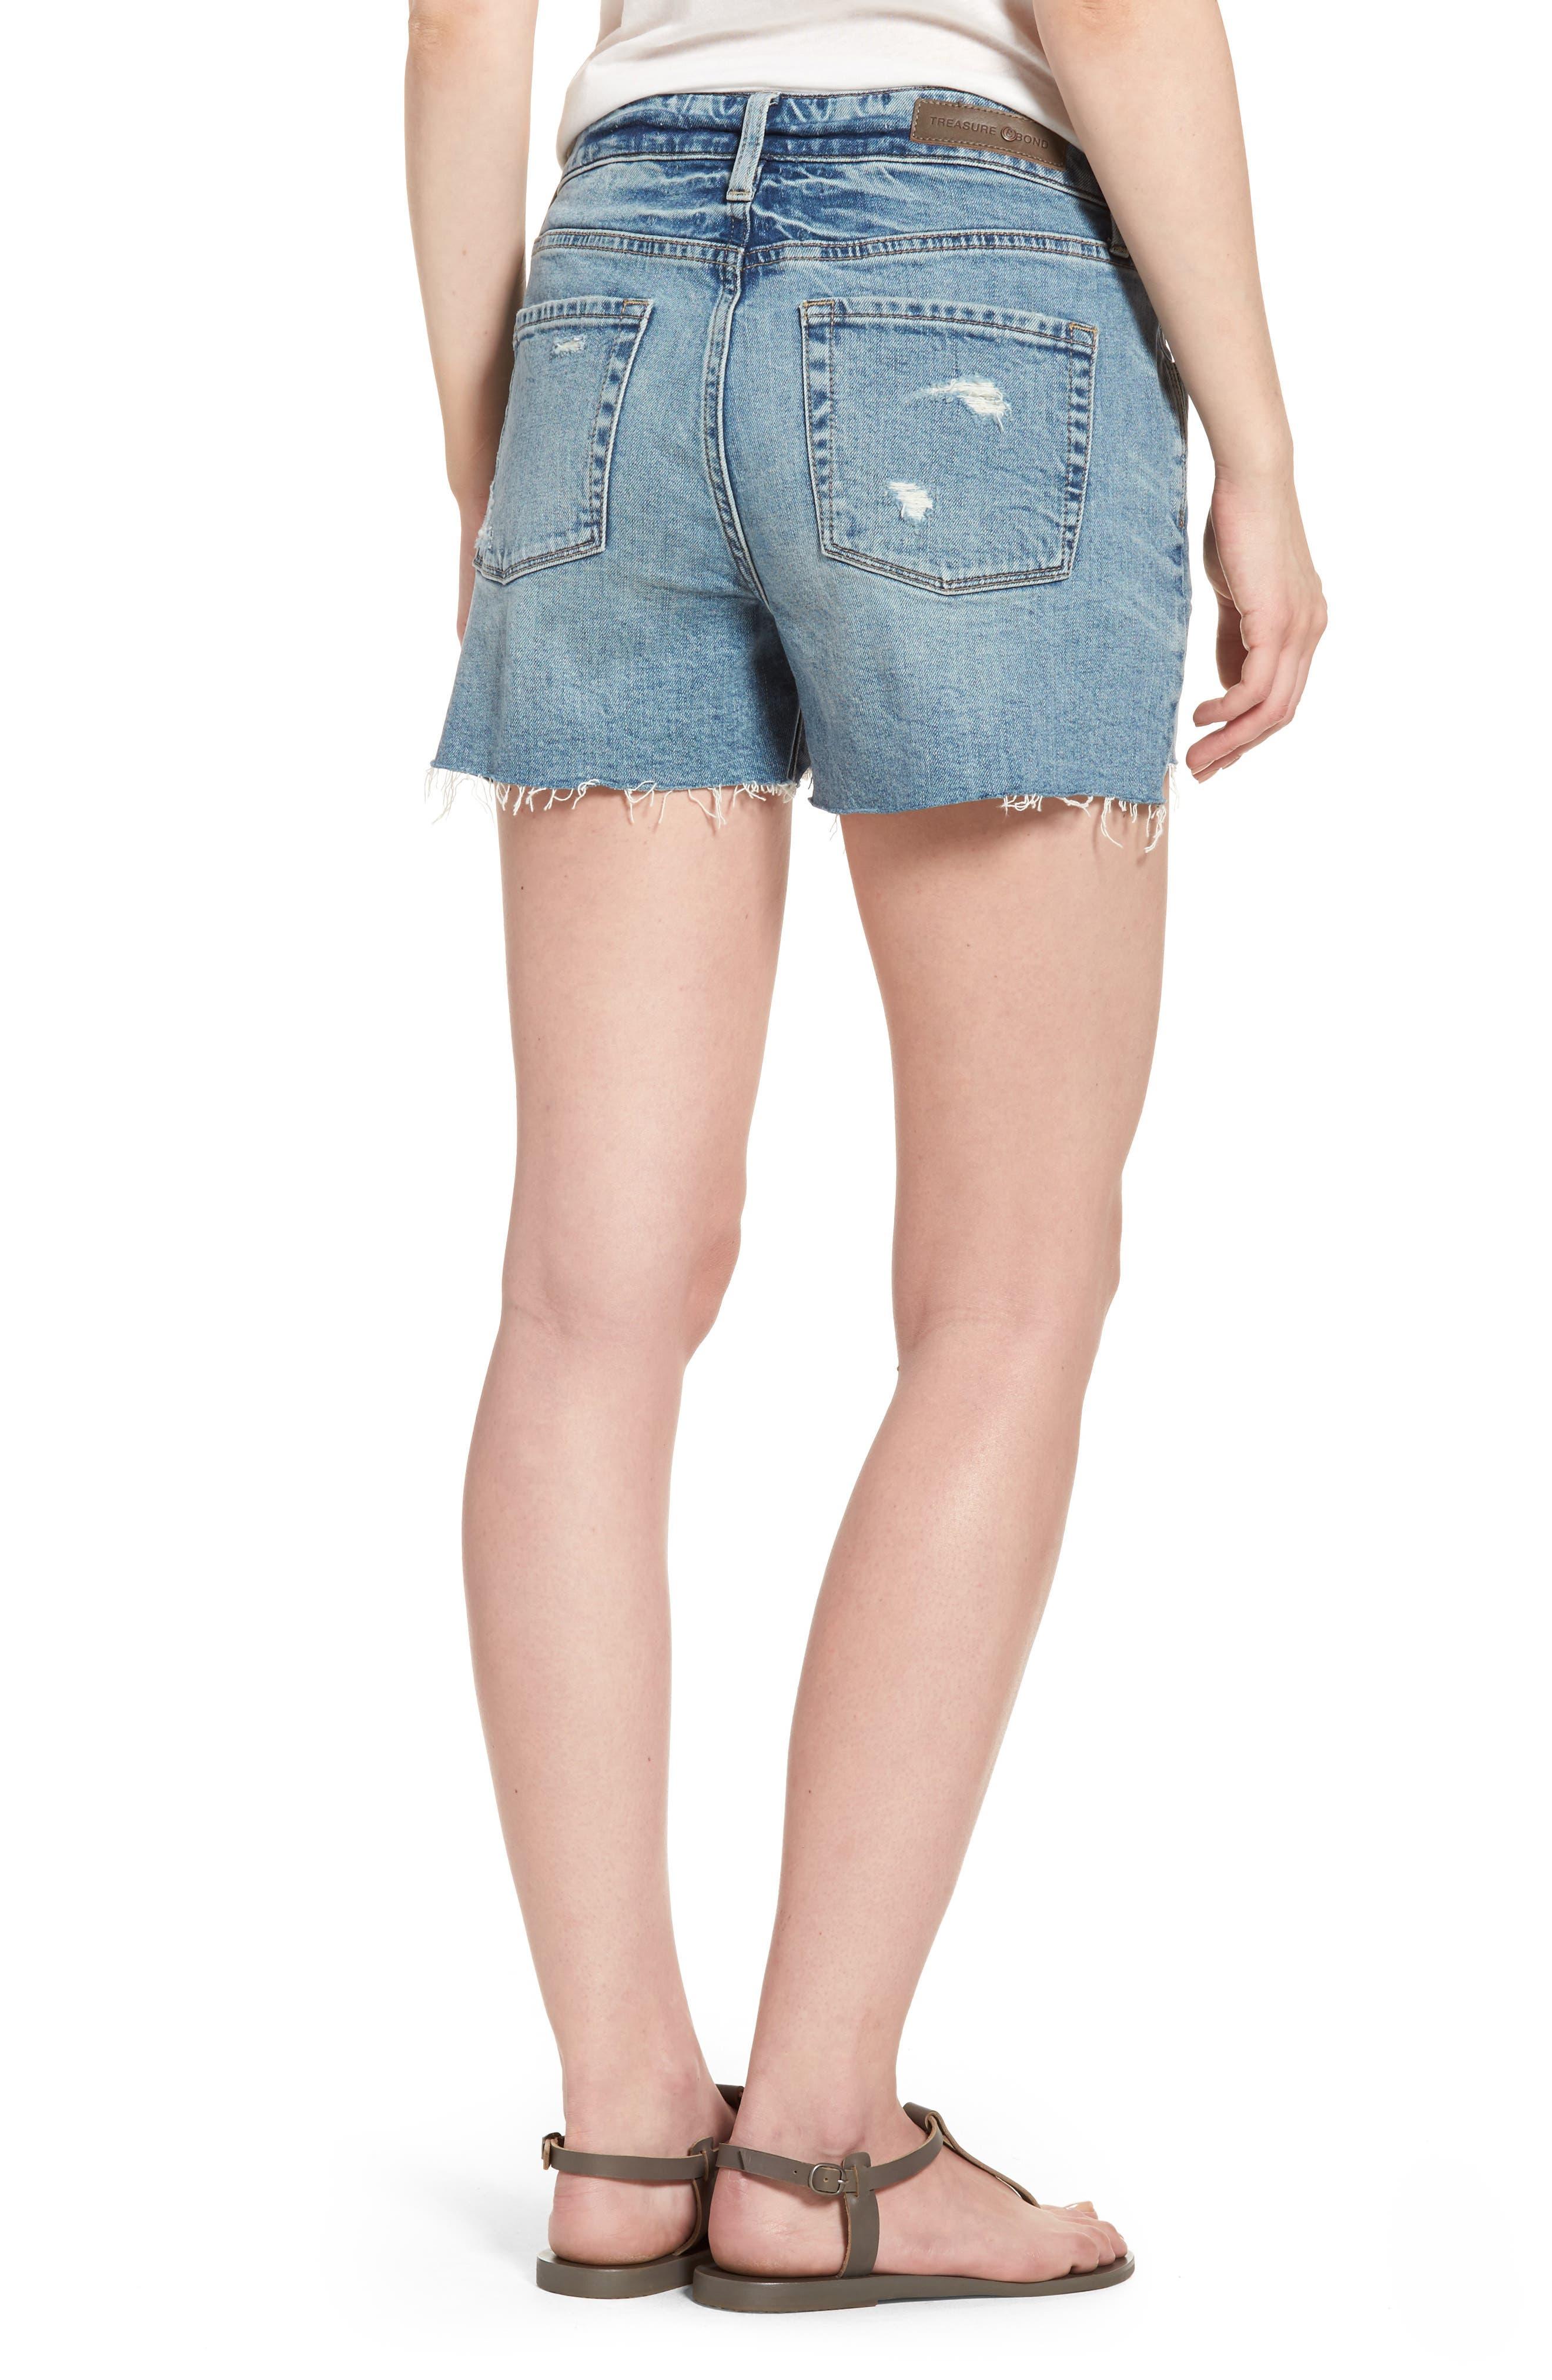 Alternate Image 2  - Treasure & Bond High Waist Boyfriend Cutoff Denim Shorts (Gravel Medium Vintage)